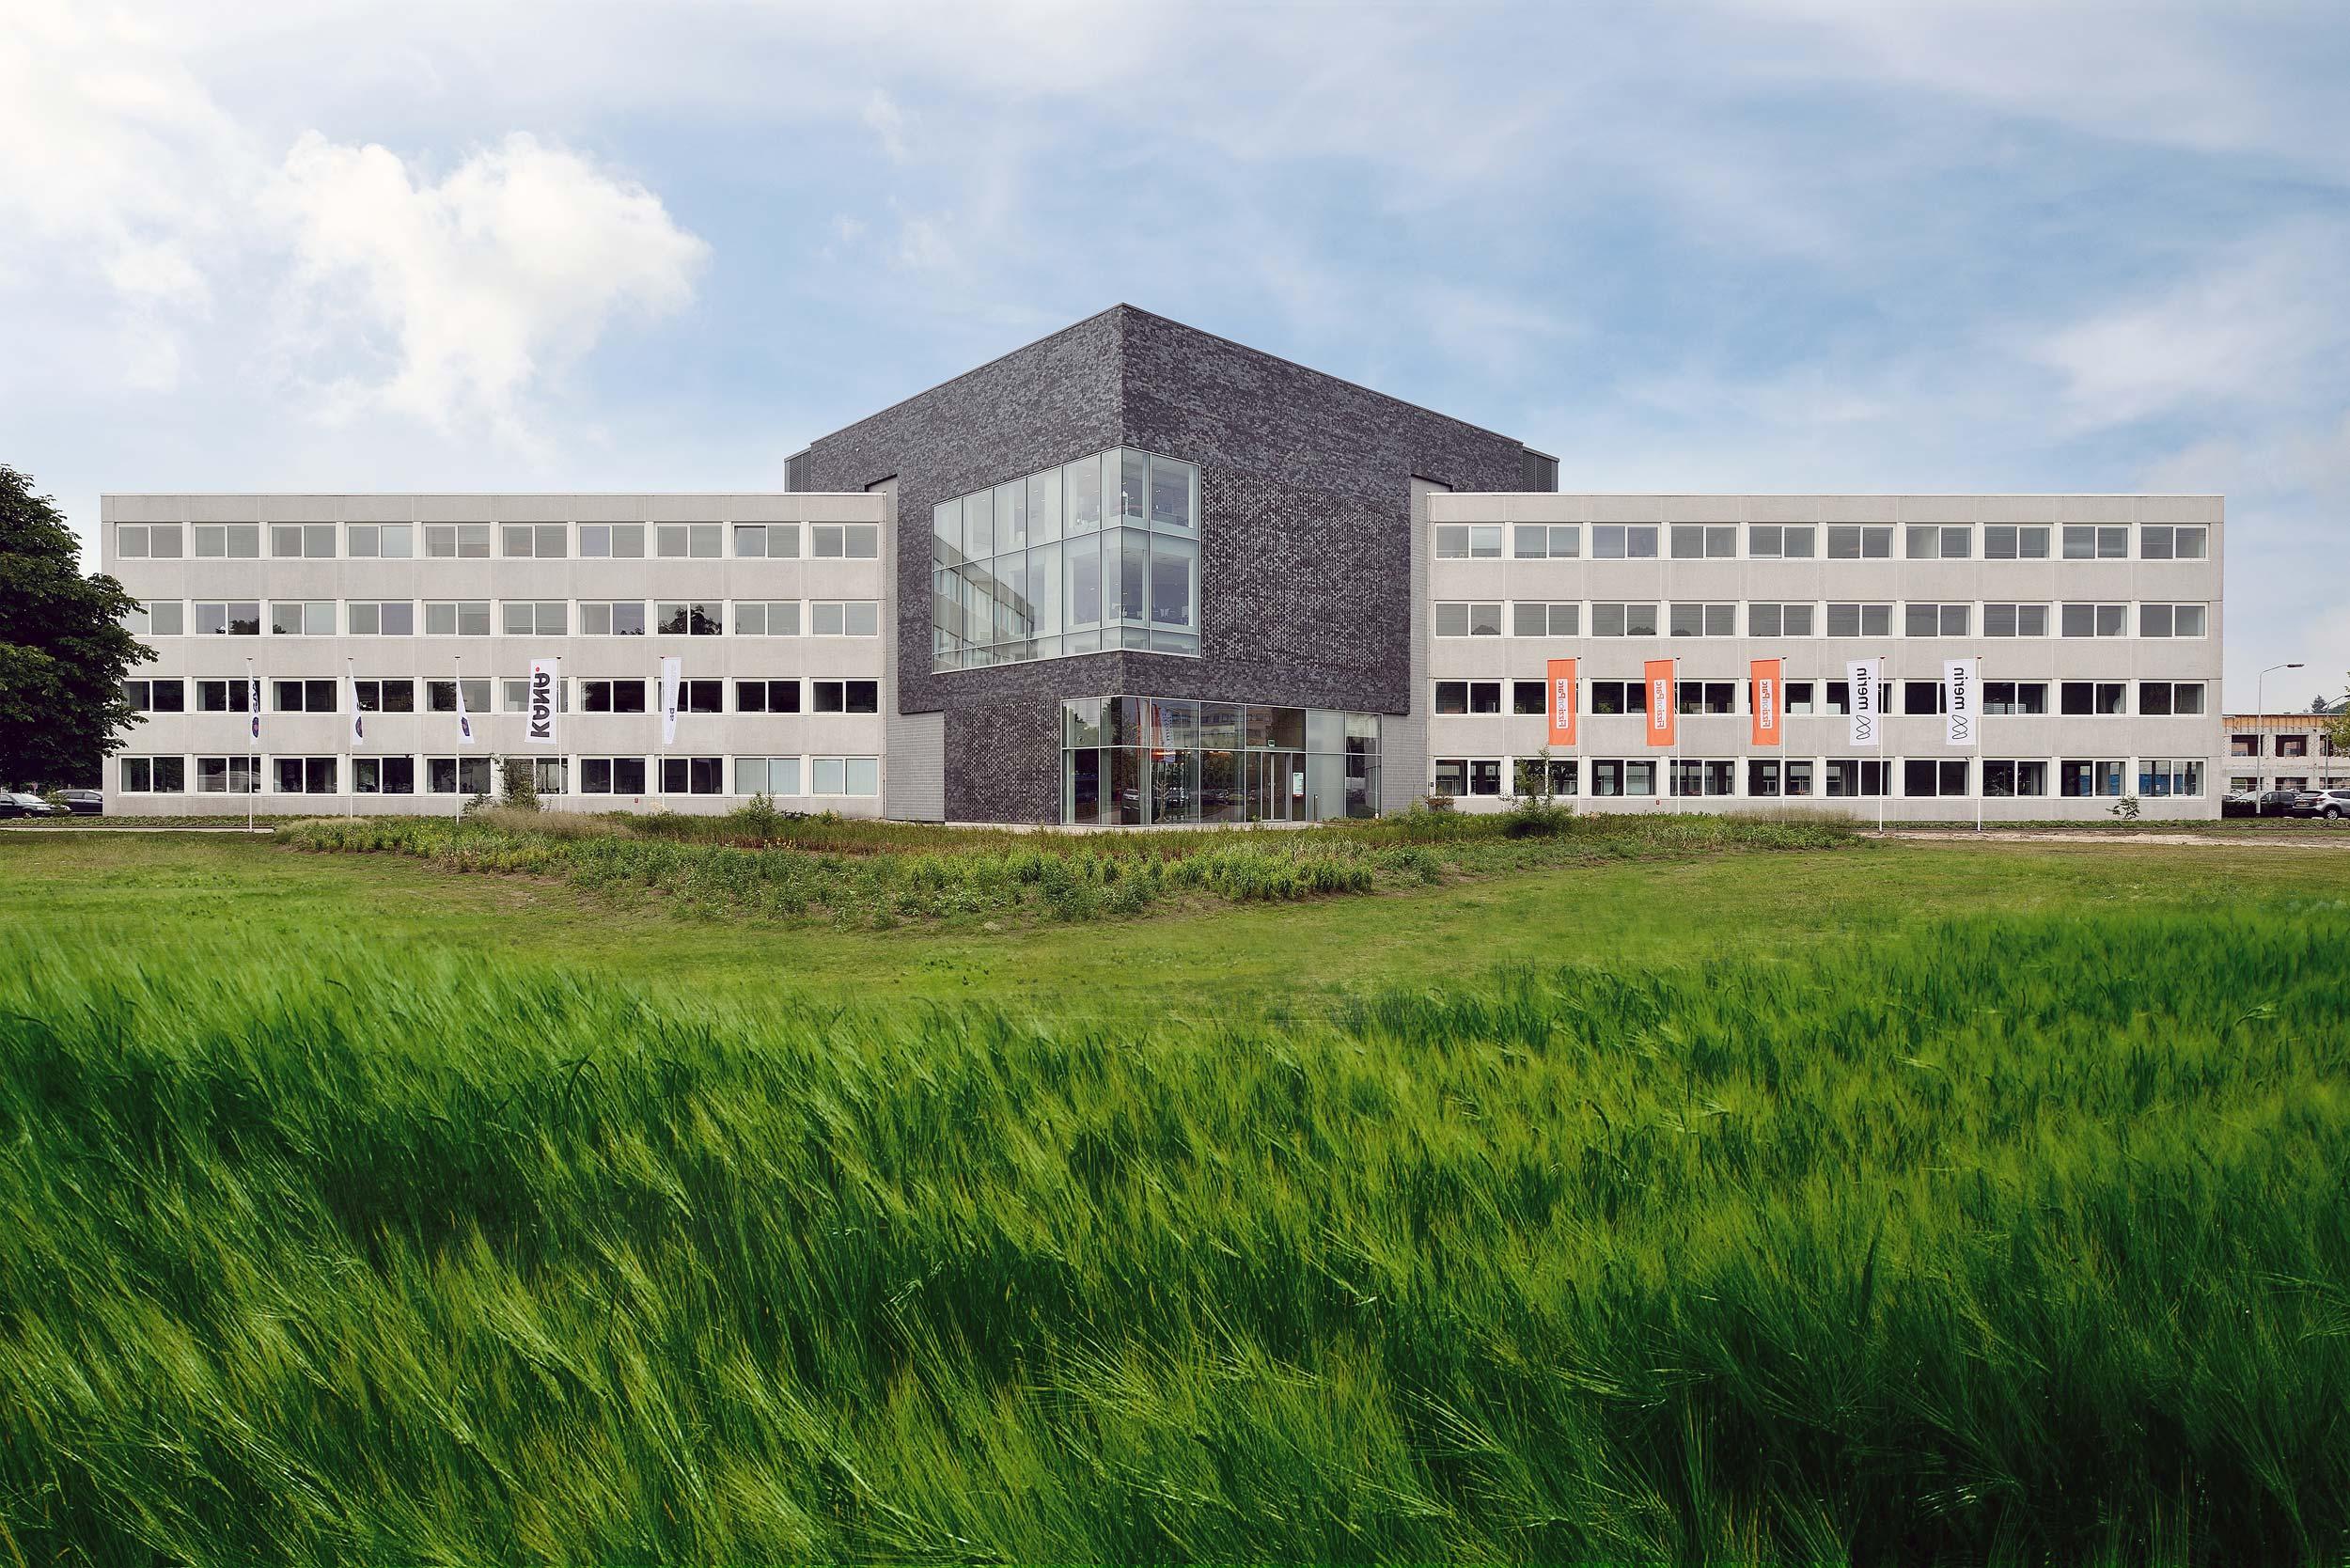 Fizzionparc kantoor - fotografie Chiel de Nooyer, architectuurfotograaf